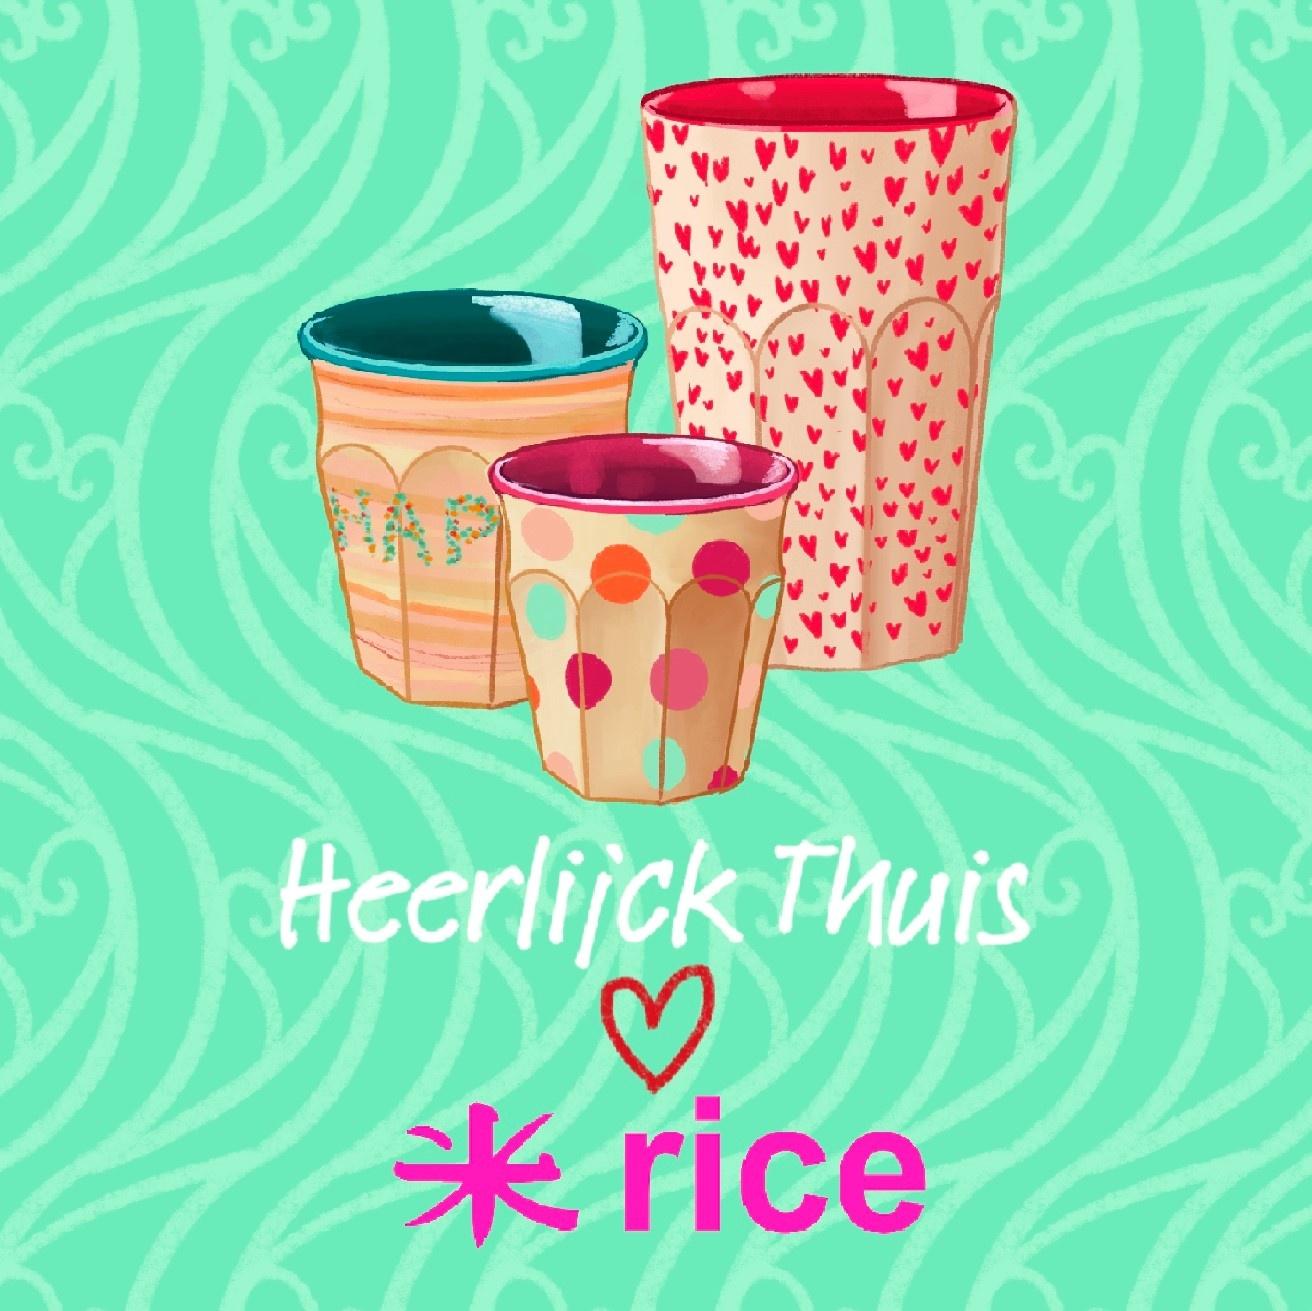 Heerlijck Thuis ❤️ Rice